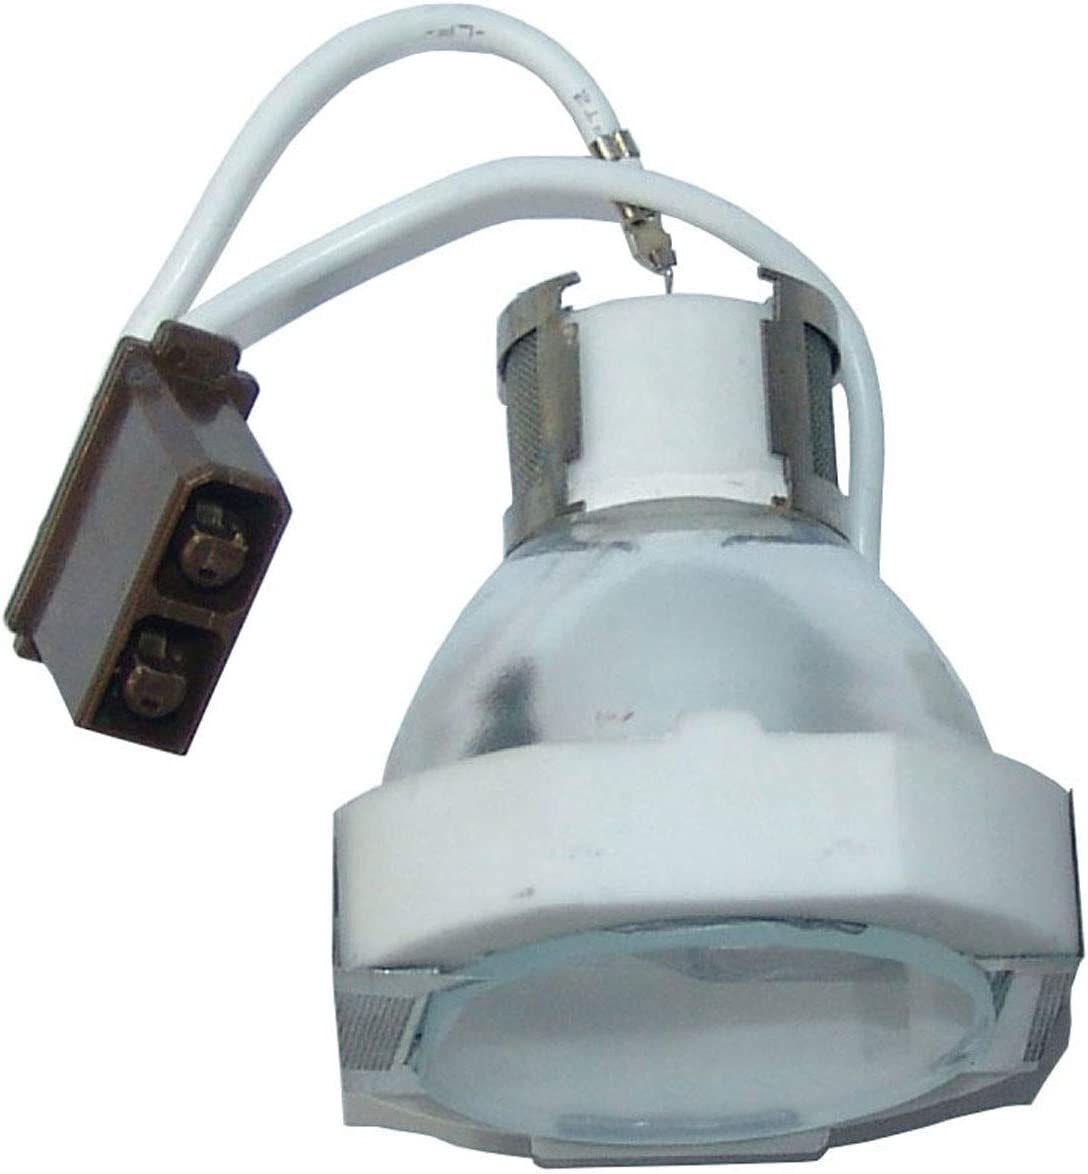 SpArc Platinum for InFocus LP350 Projector Lamp with Enclosure